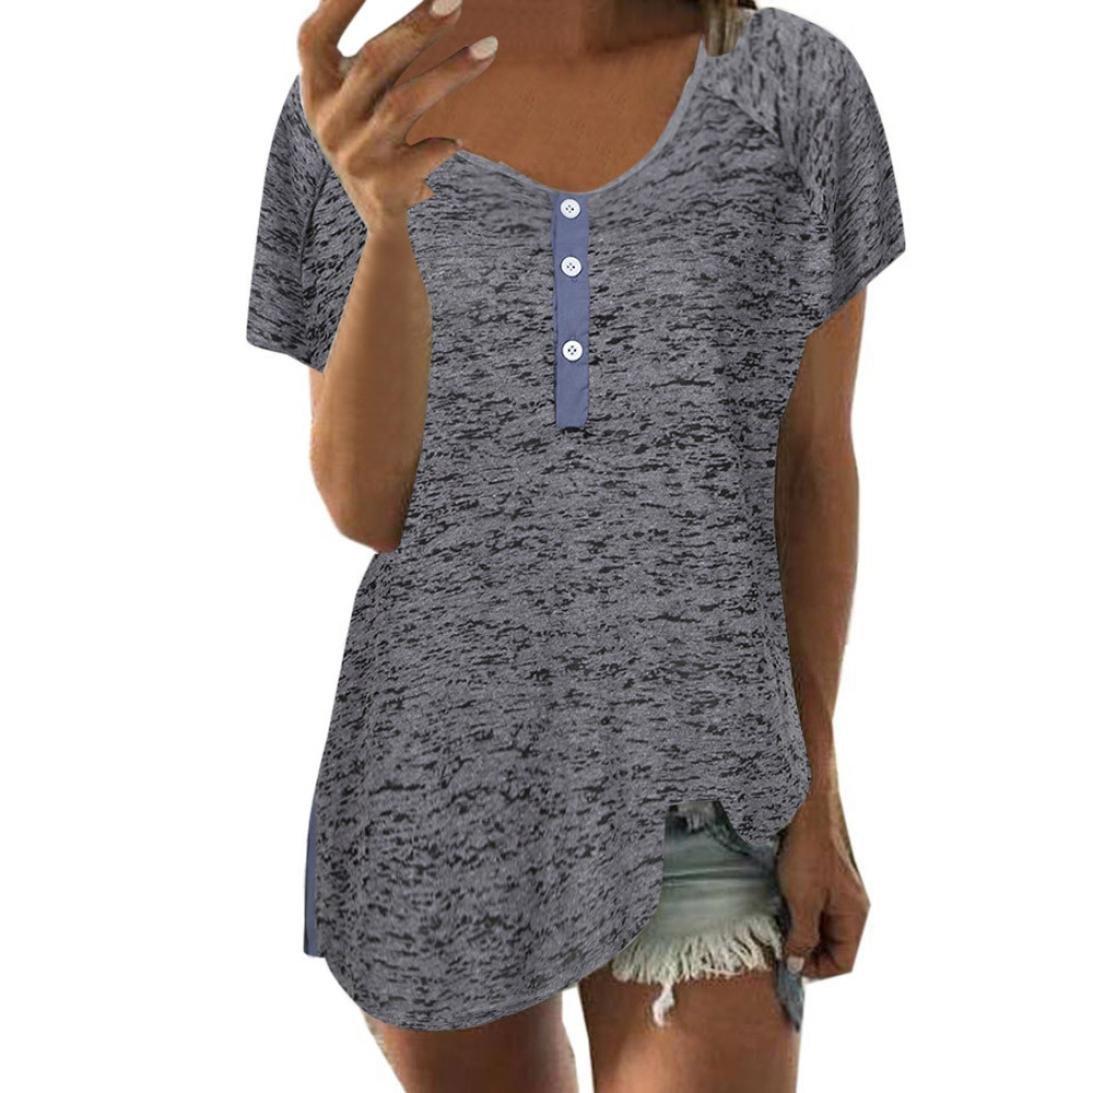 Tops para Mujer,RETUROM Las Mujeres de Manga Corta Floja Botón Ocasional Blusa Camiseta sin Mangas: Amazon.es: Ropa y accesorios